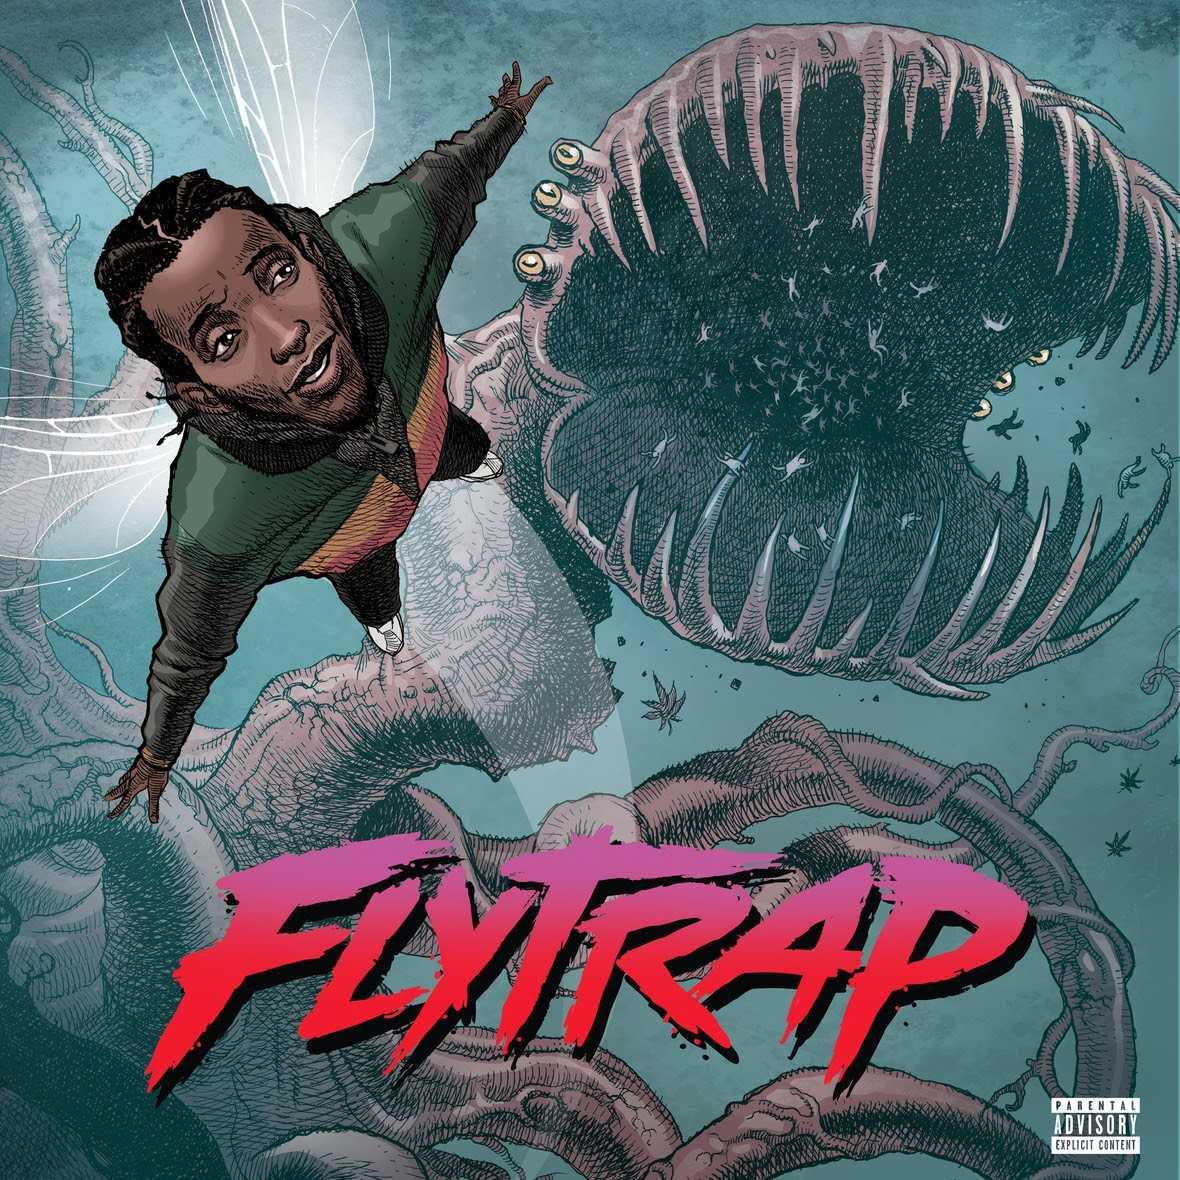 Pro Era's CJ FLY Announces New Album FLYTRAP [Music News]